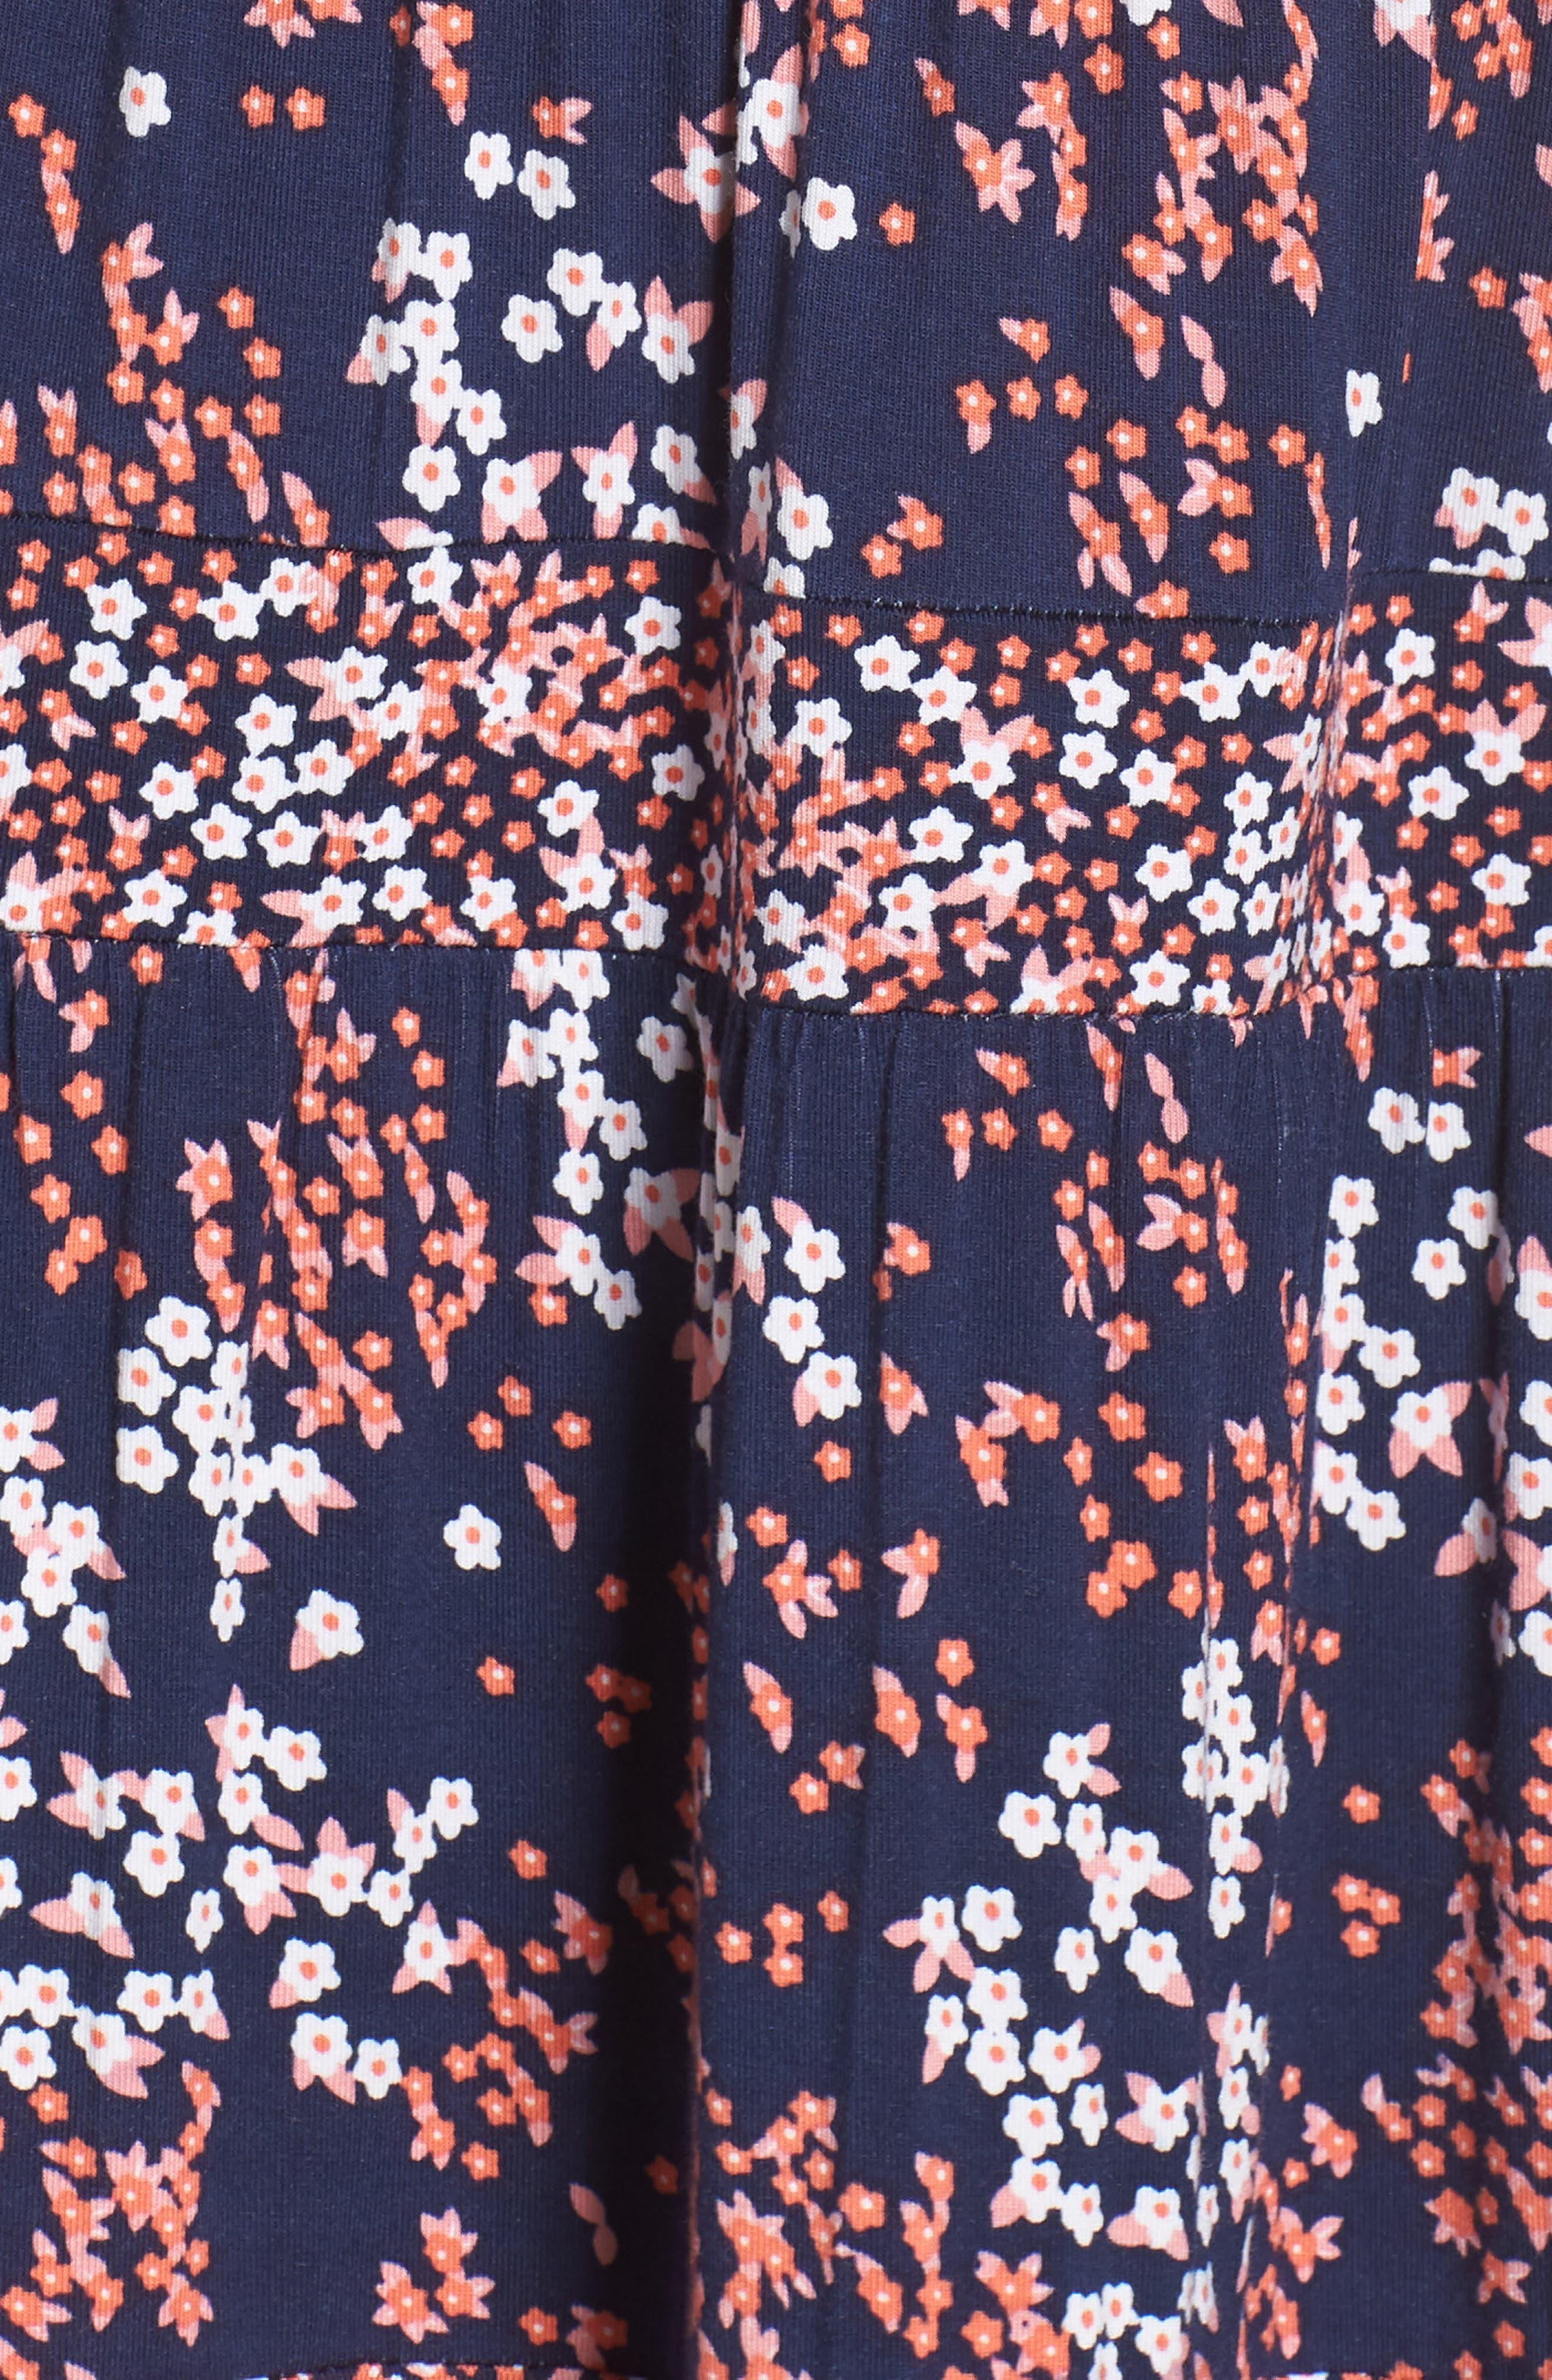 Blooms Border Tiered Dress,                             Alternate thumbnail 6, color,                             True Navy/ Bright Blush